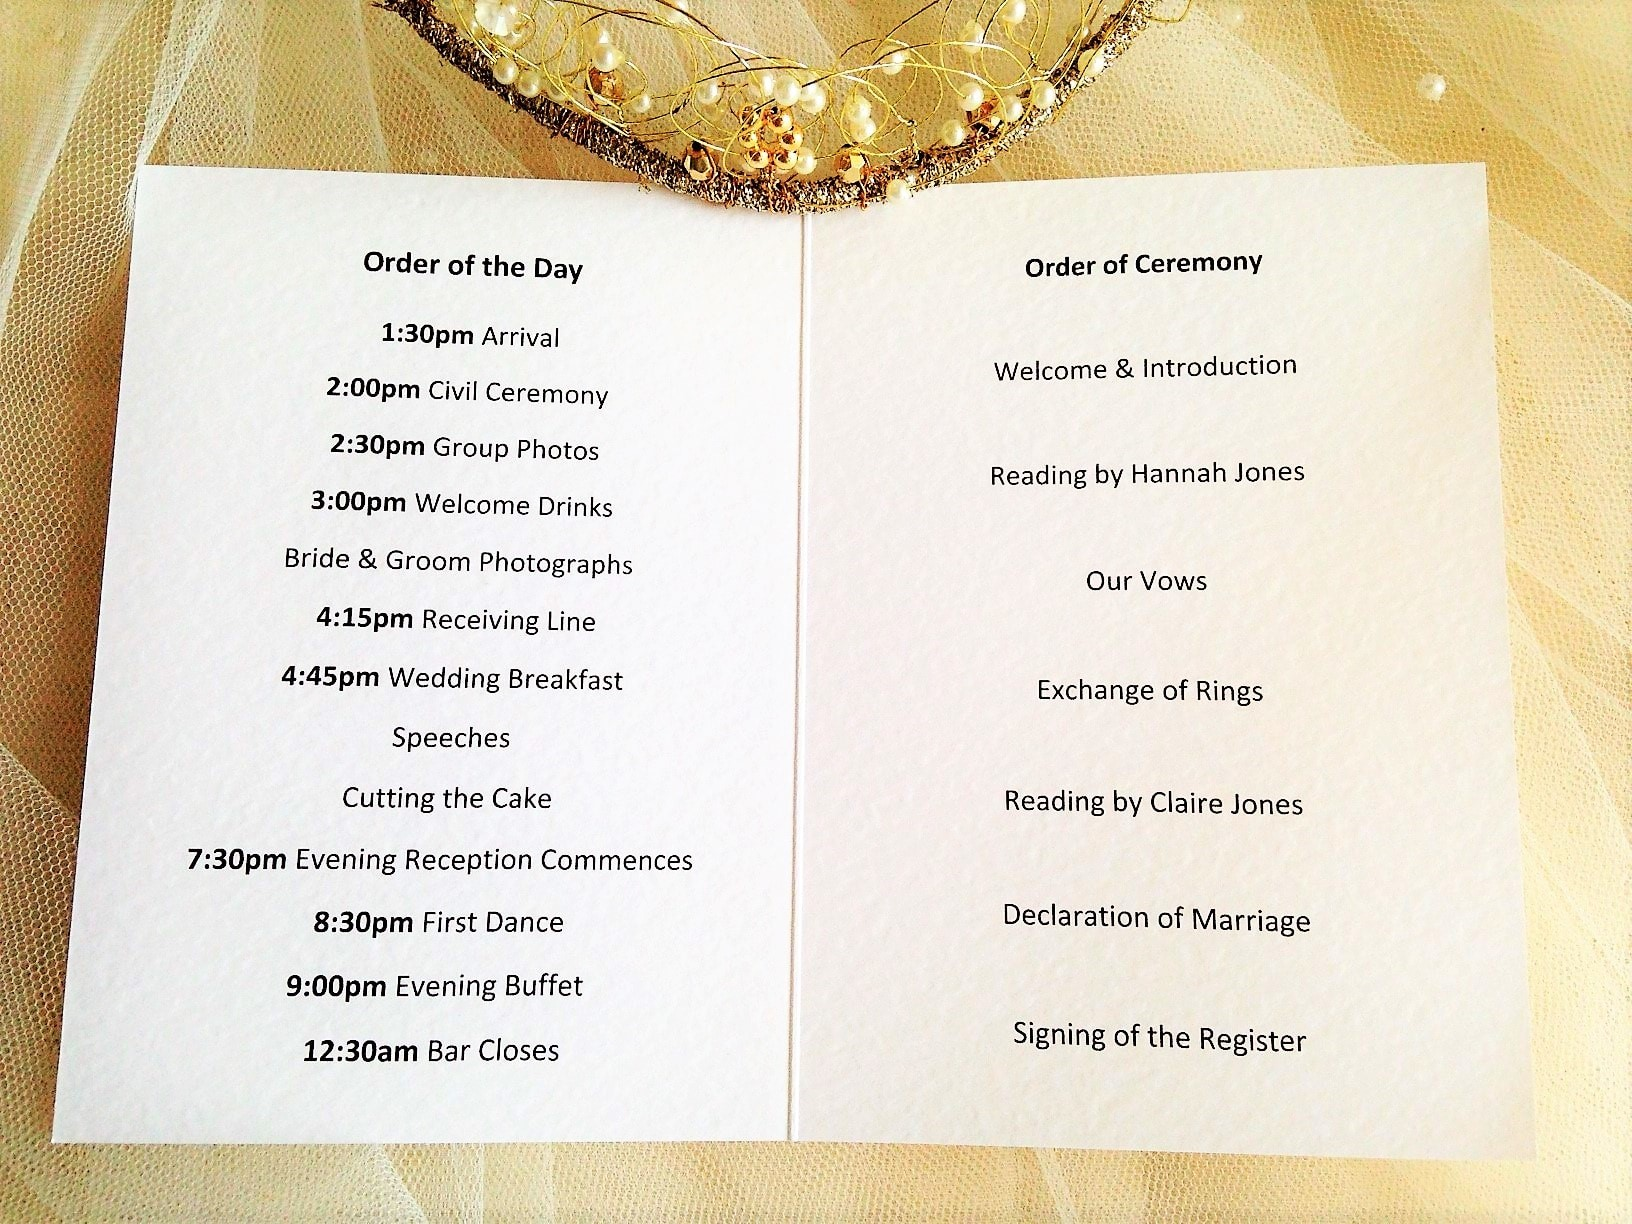 small diamante heart wedding order of service books. Black Bedroom Furniture Sets. Home Design Ideas